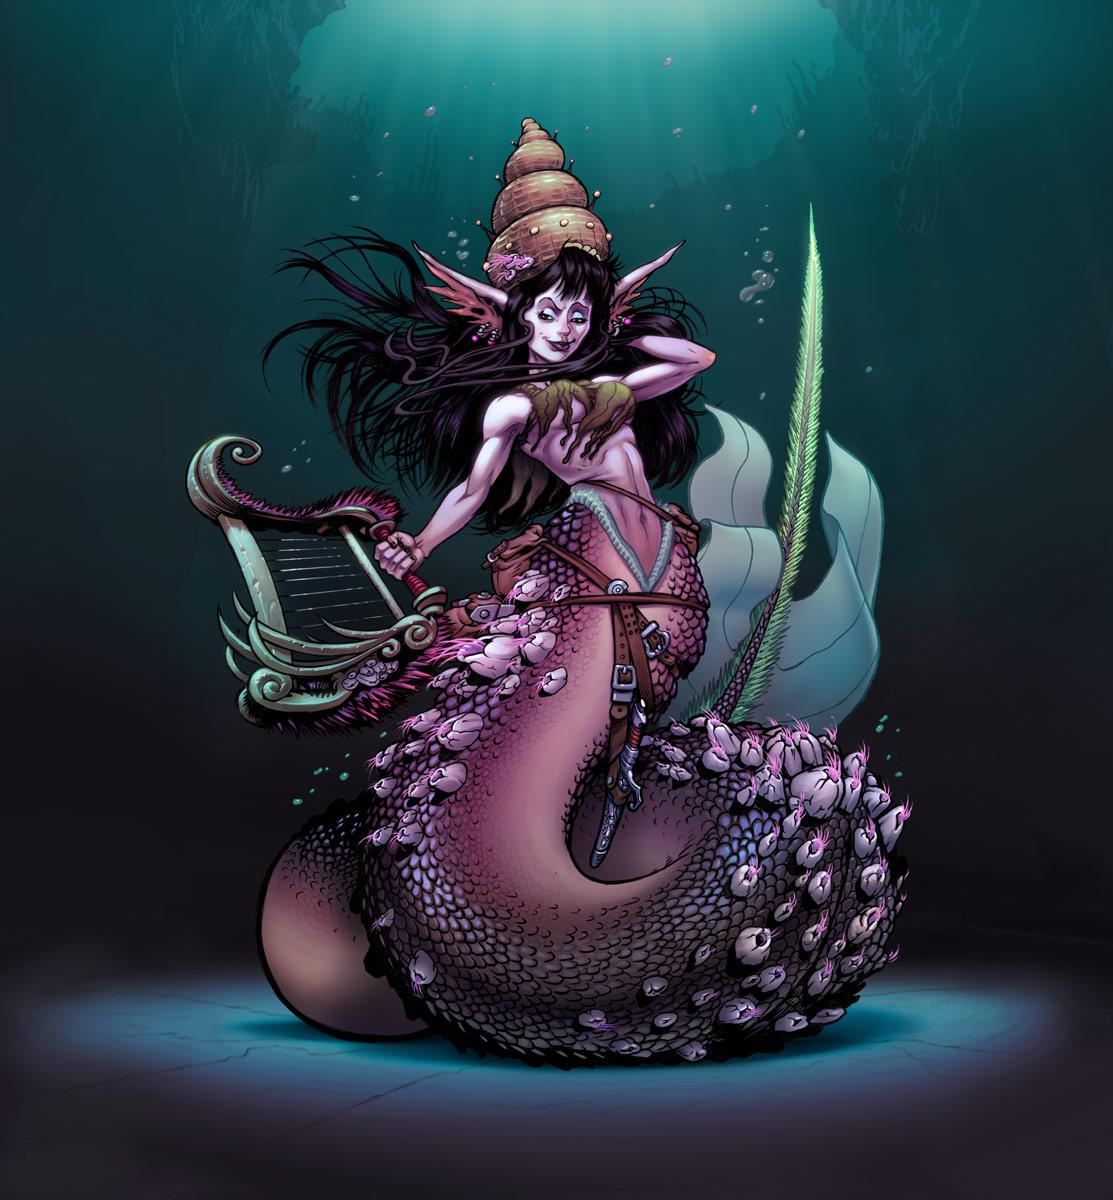 Cccjam New Mermaid by danimation2001